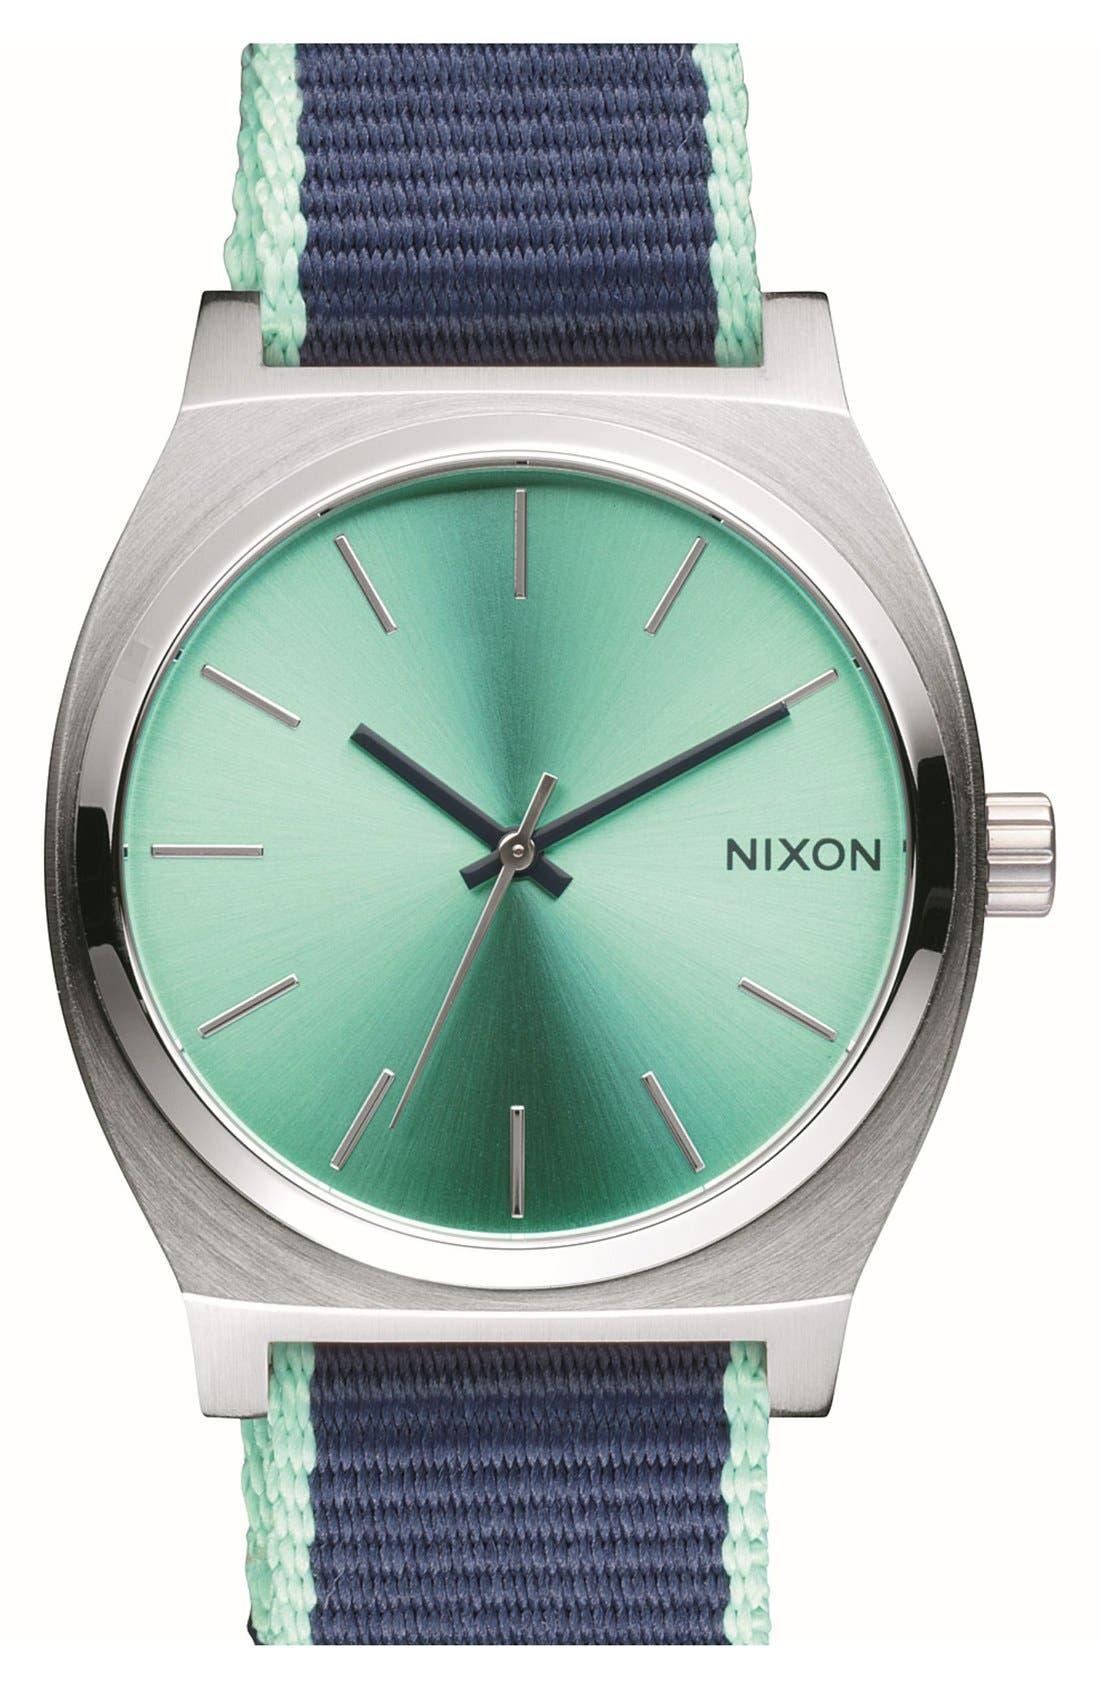 Main Image - Nixon 'Time Teller' Canvas Strap Watch, 37mm